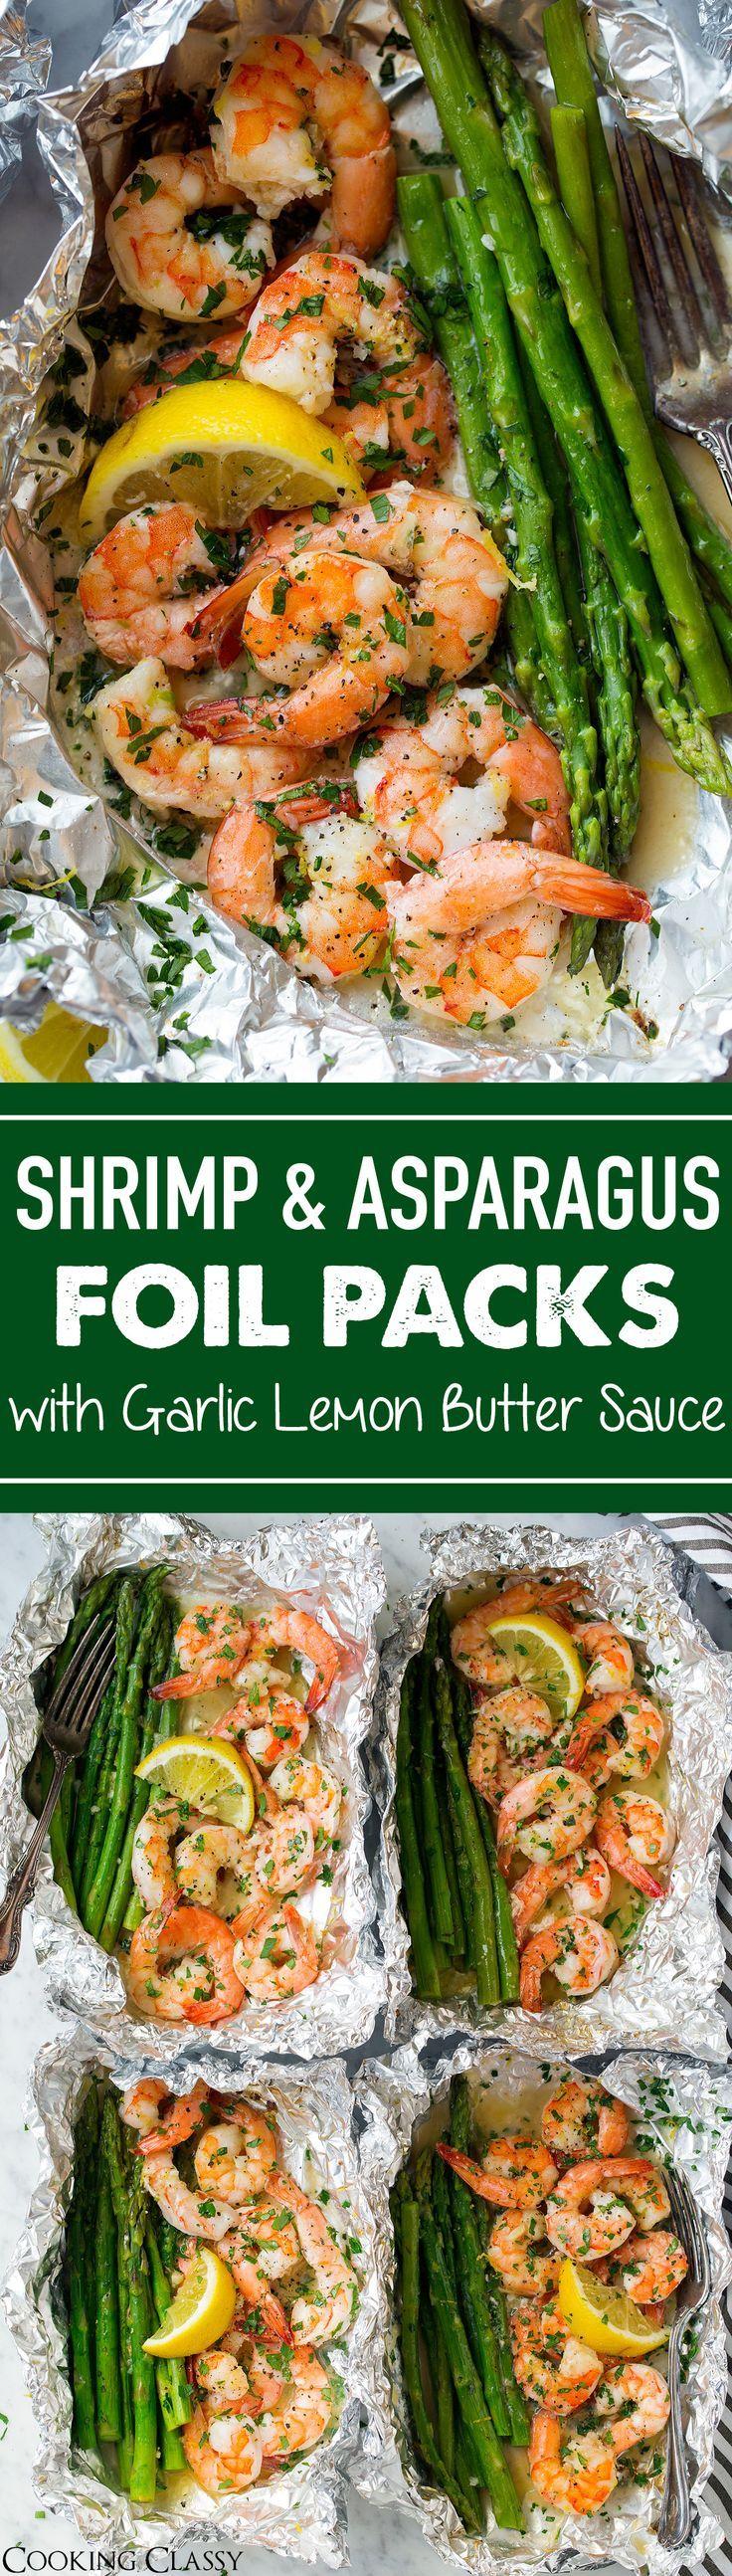 Shrimp and Asparagus Foil Packs with Garlic Lemon Butter Sauce - Cooking Classy (Foil Grilling Recipes)